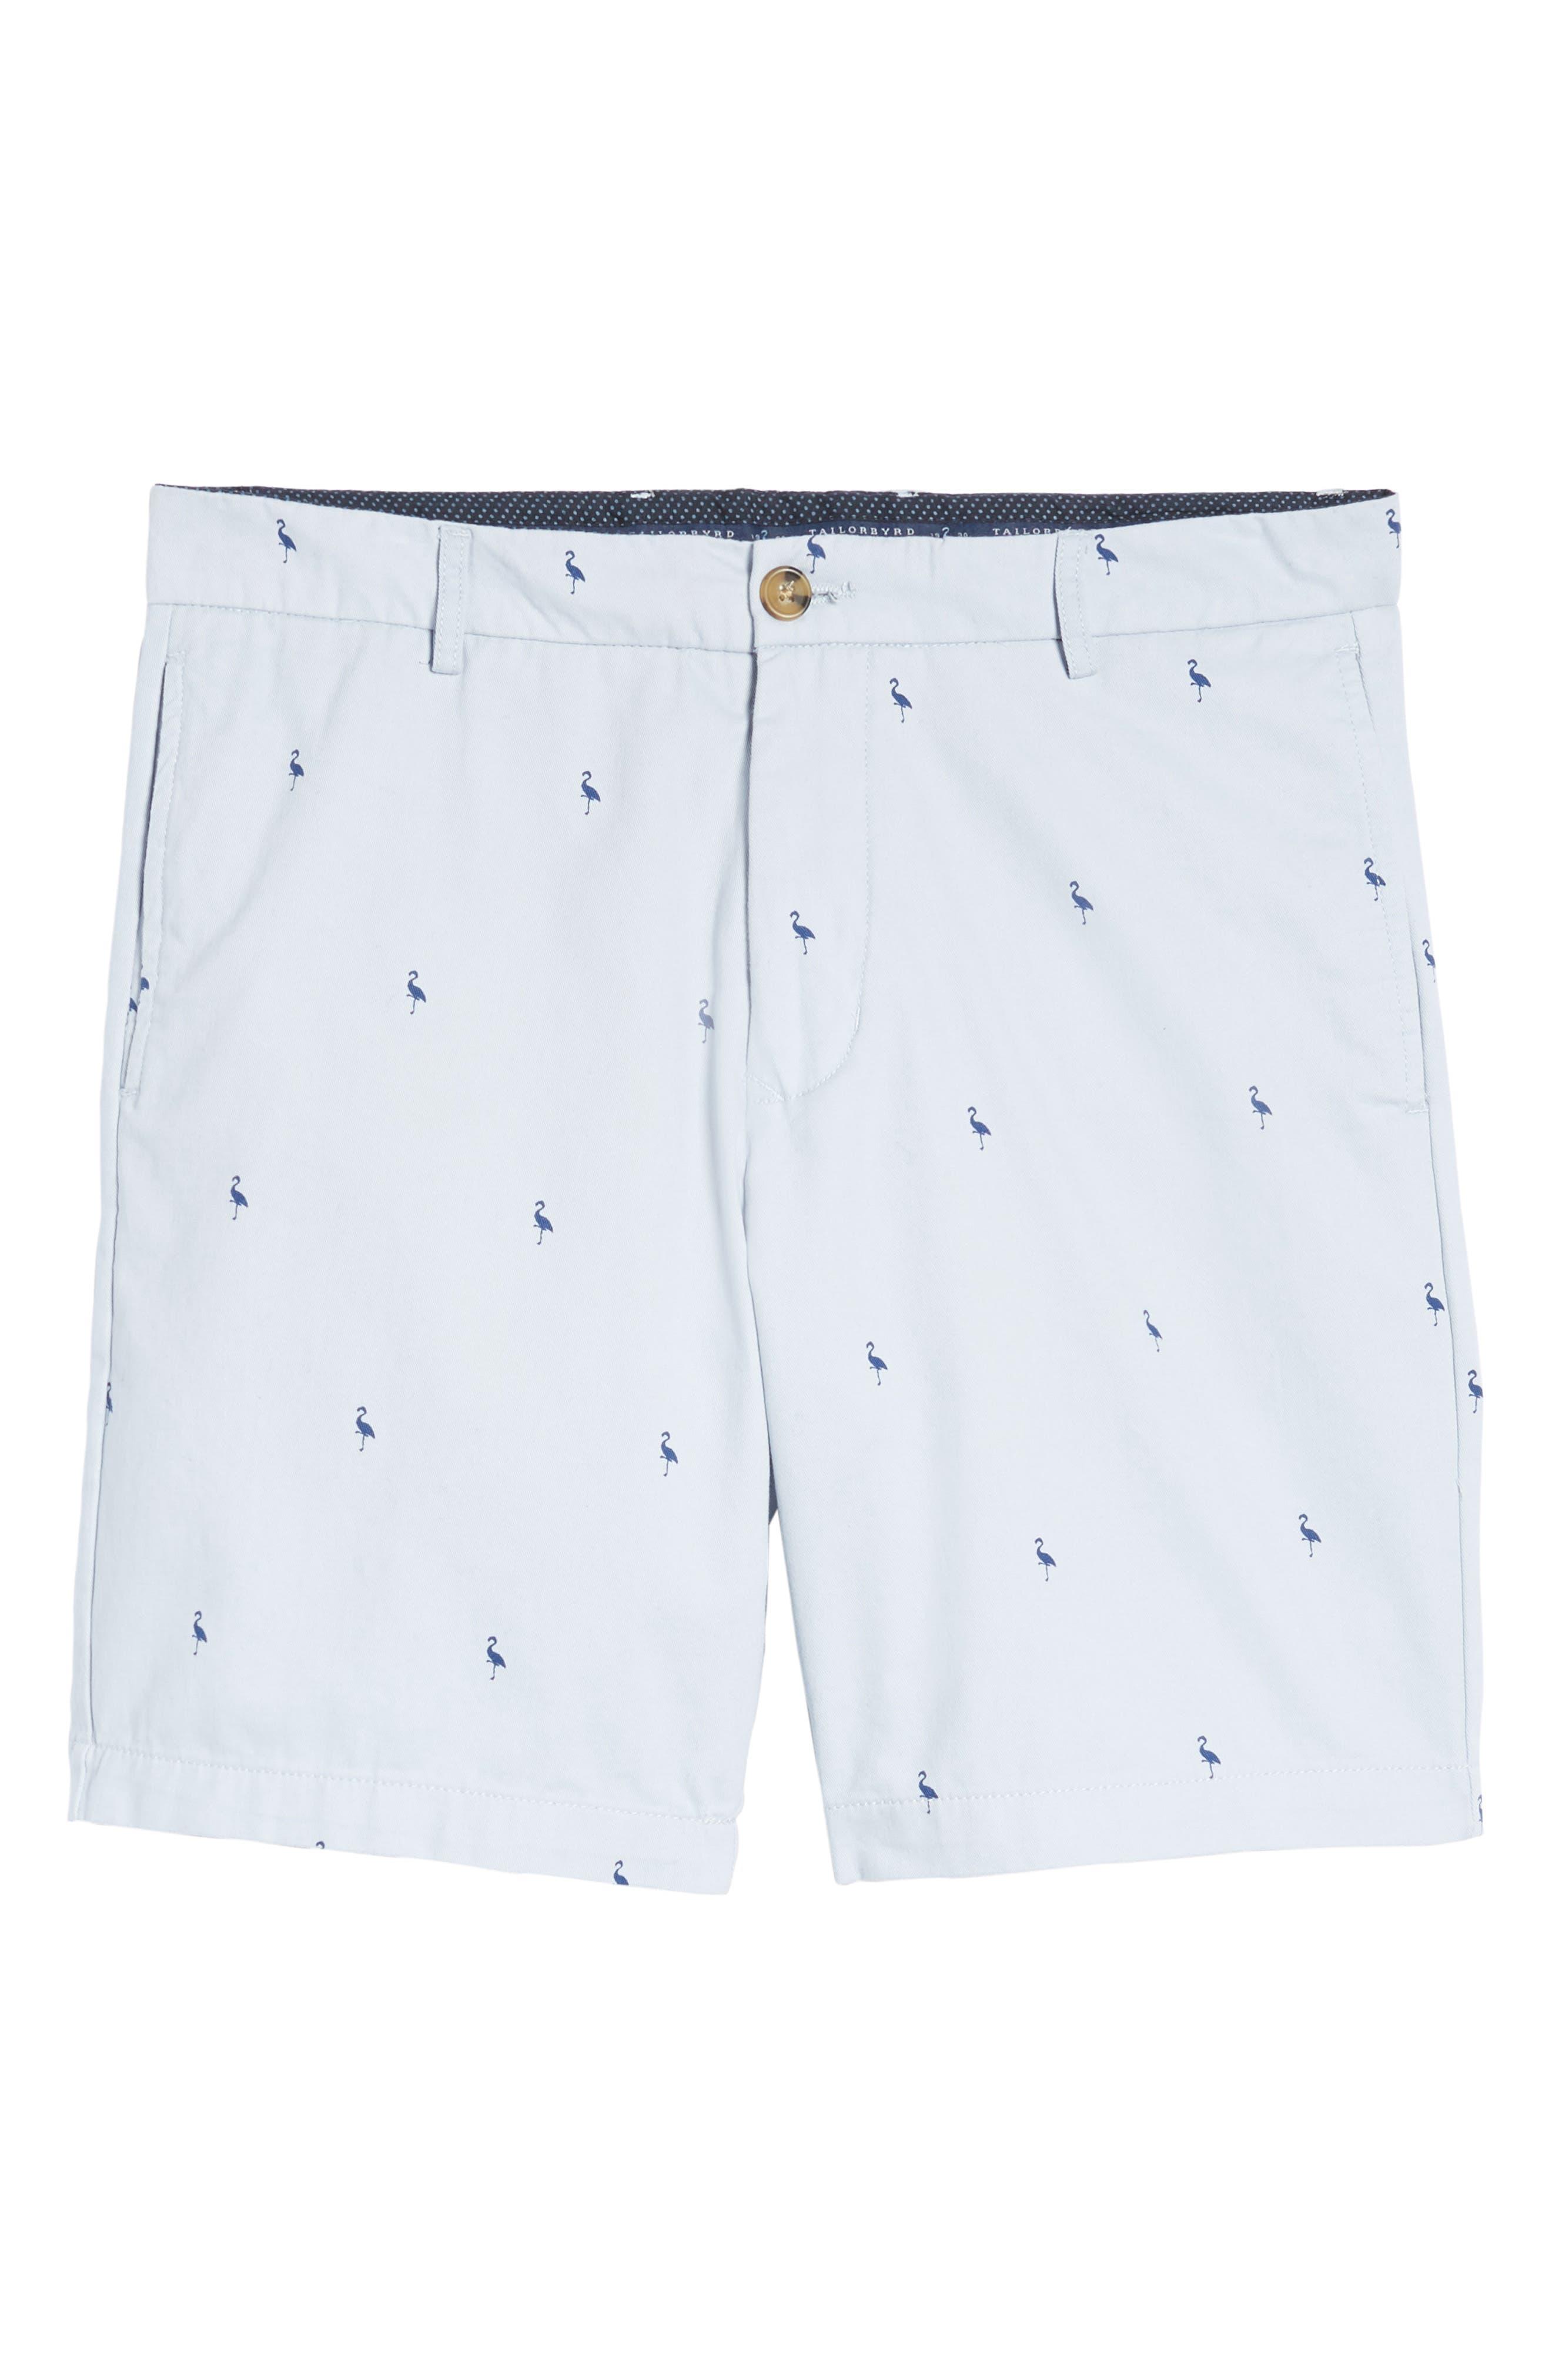 Aiden Bird Regular Fit Chino Shorts,                             Alternate thumbnail 6, color,                             450